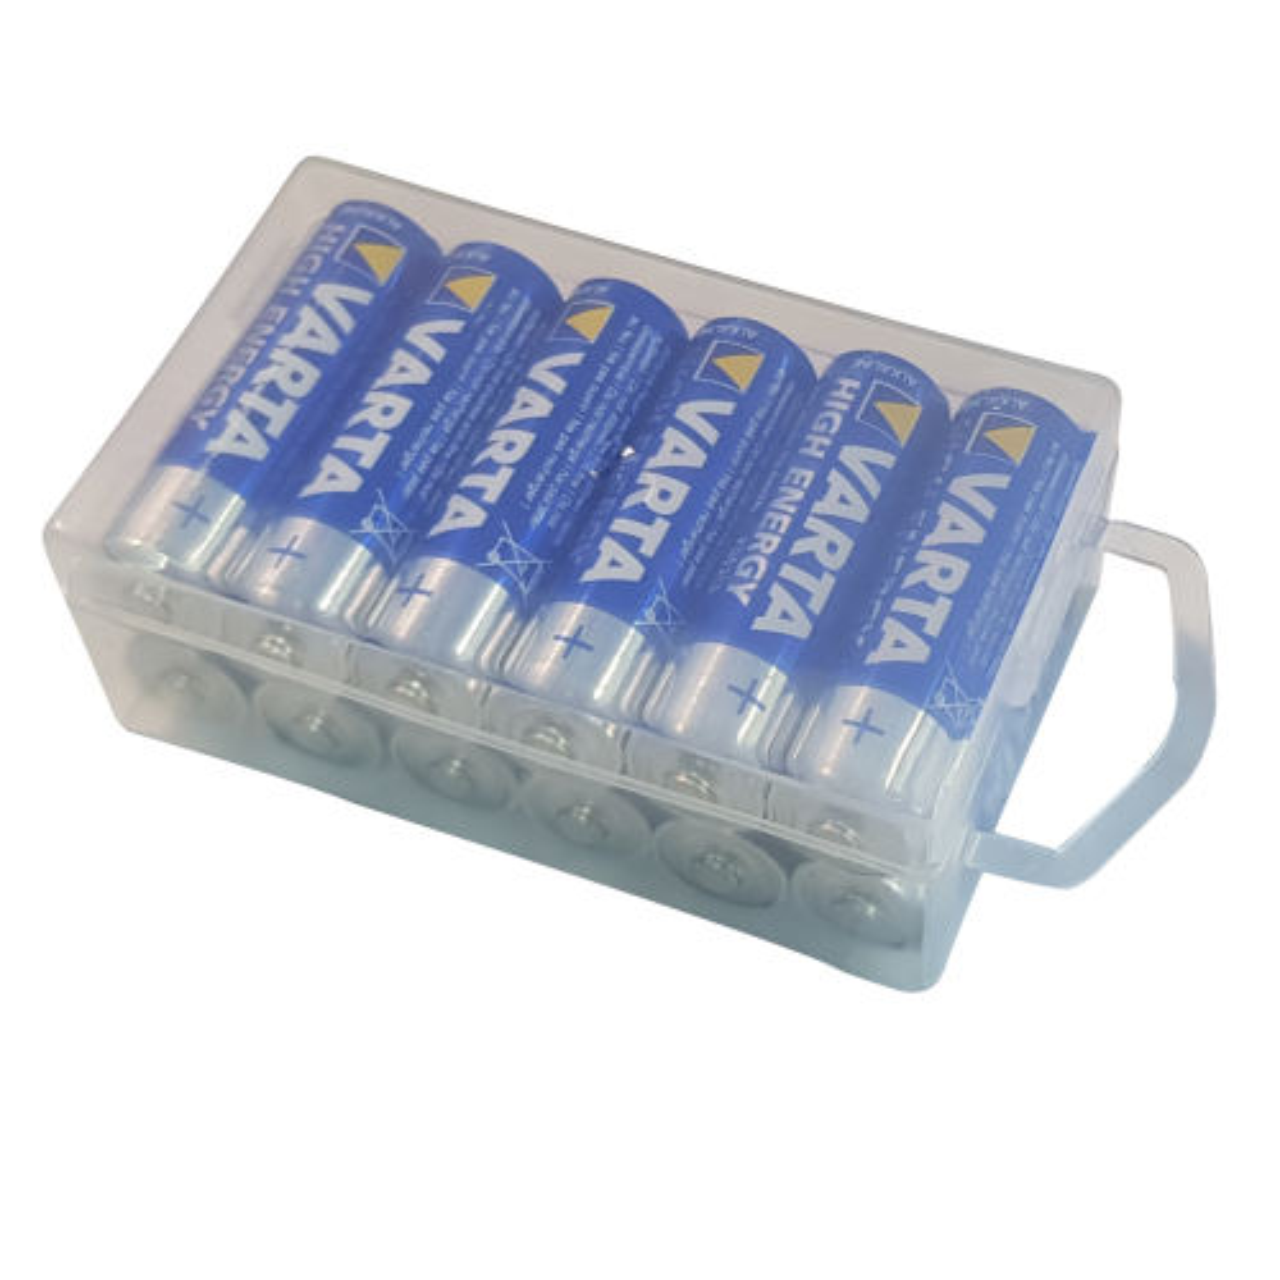 باتری قلمی وارتا مدل  High Energy Alkaline LR6AA بسته 12 عددی